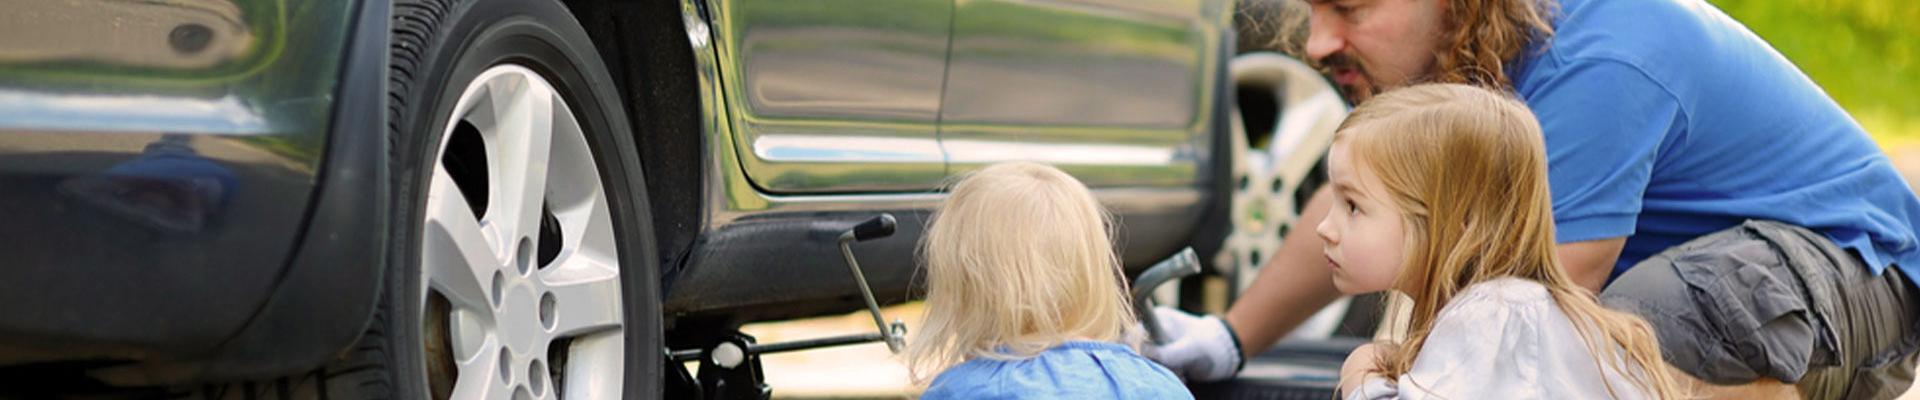 auto-meisjes-pech-header-1920x400 2